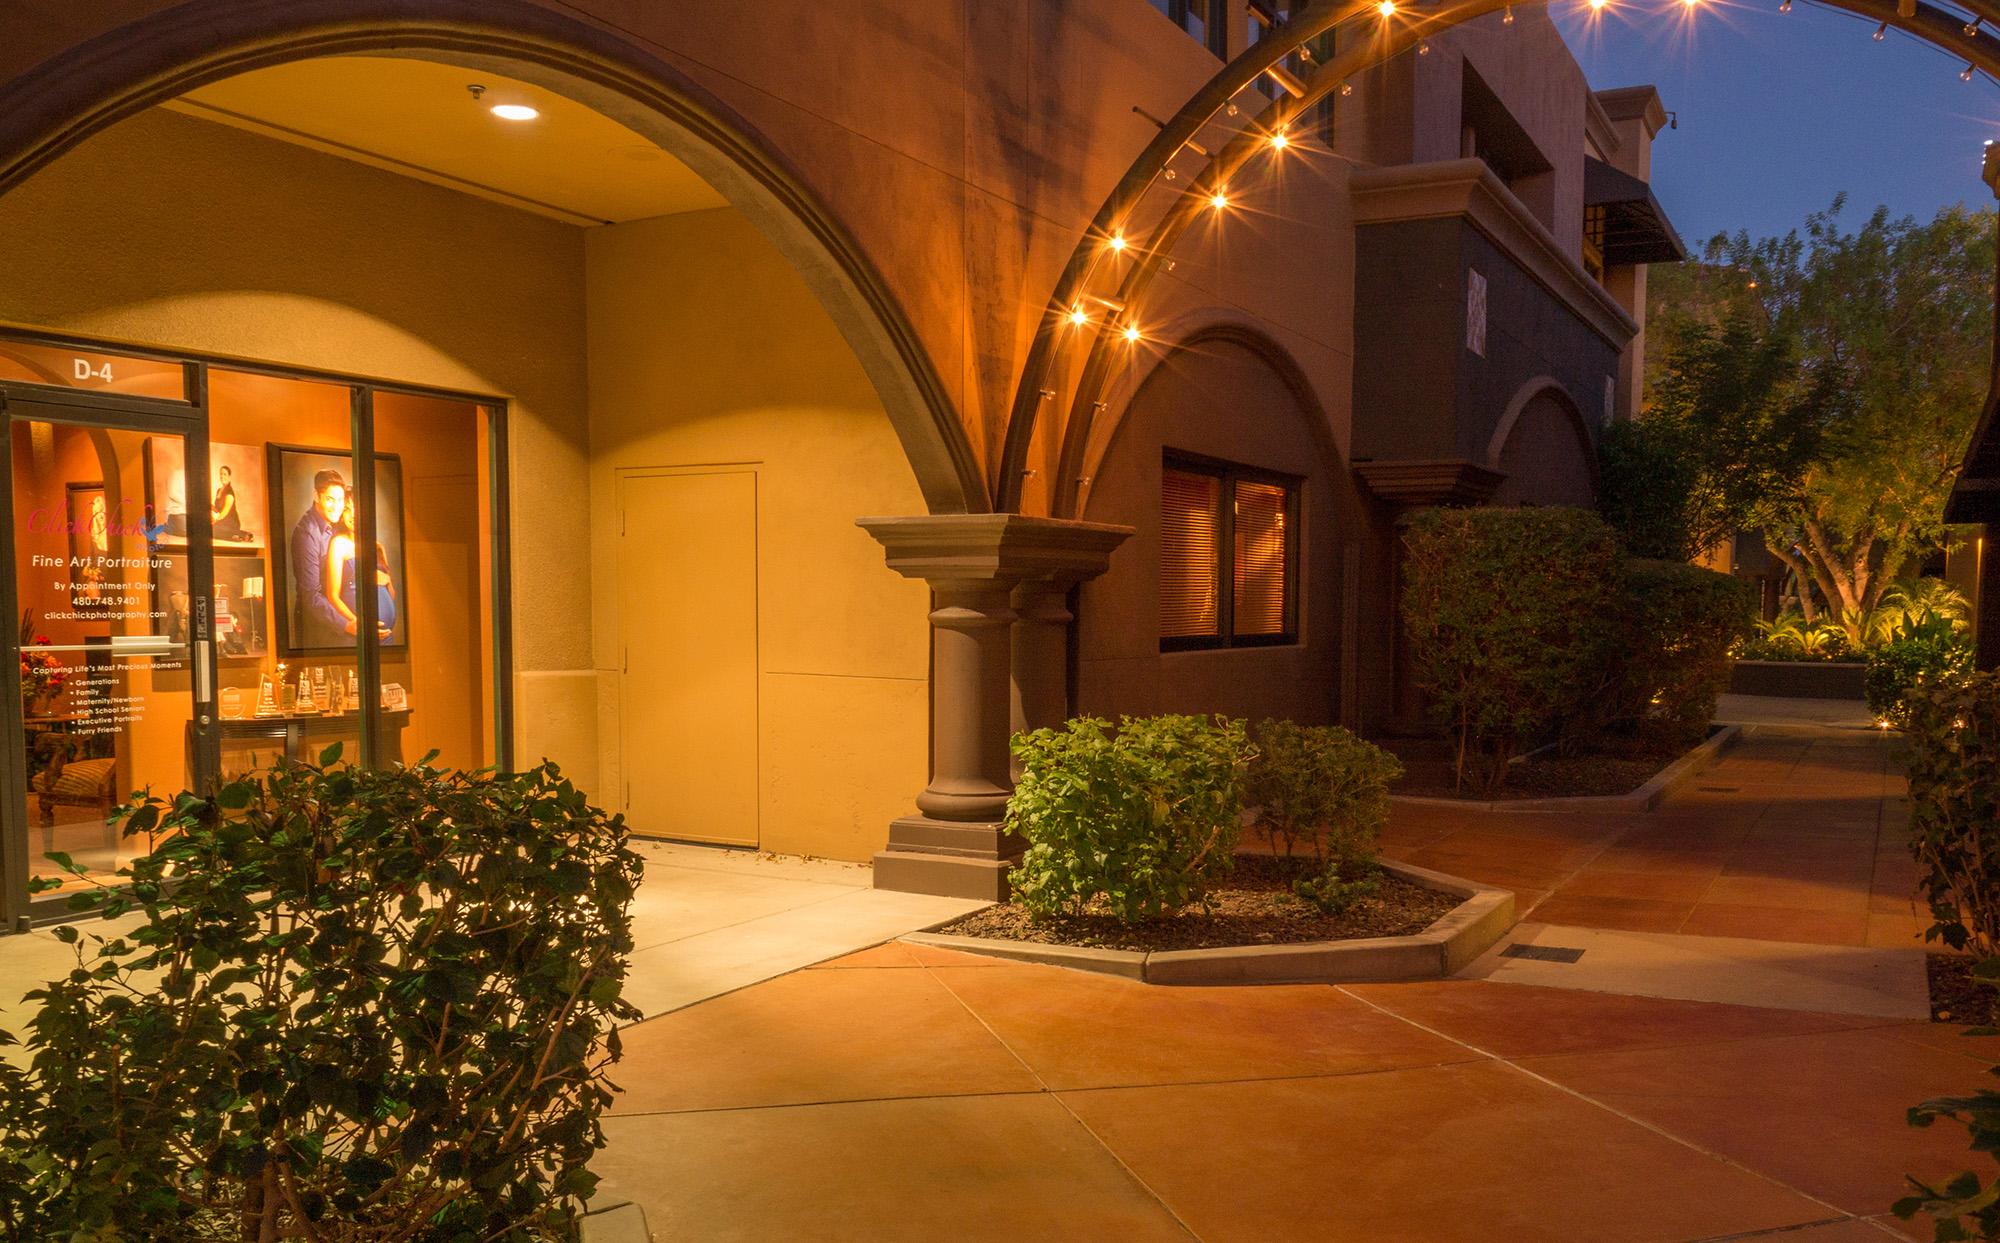 Scottsdale Photography Studio